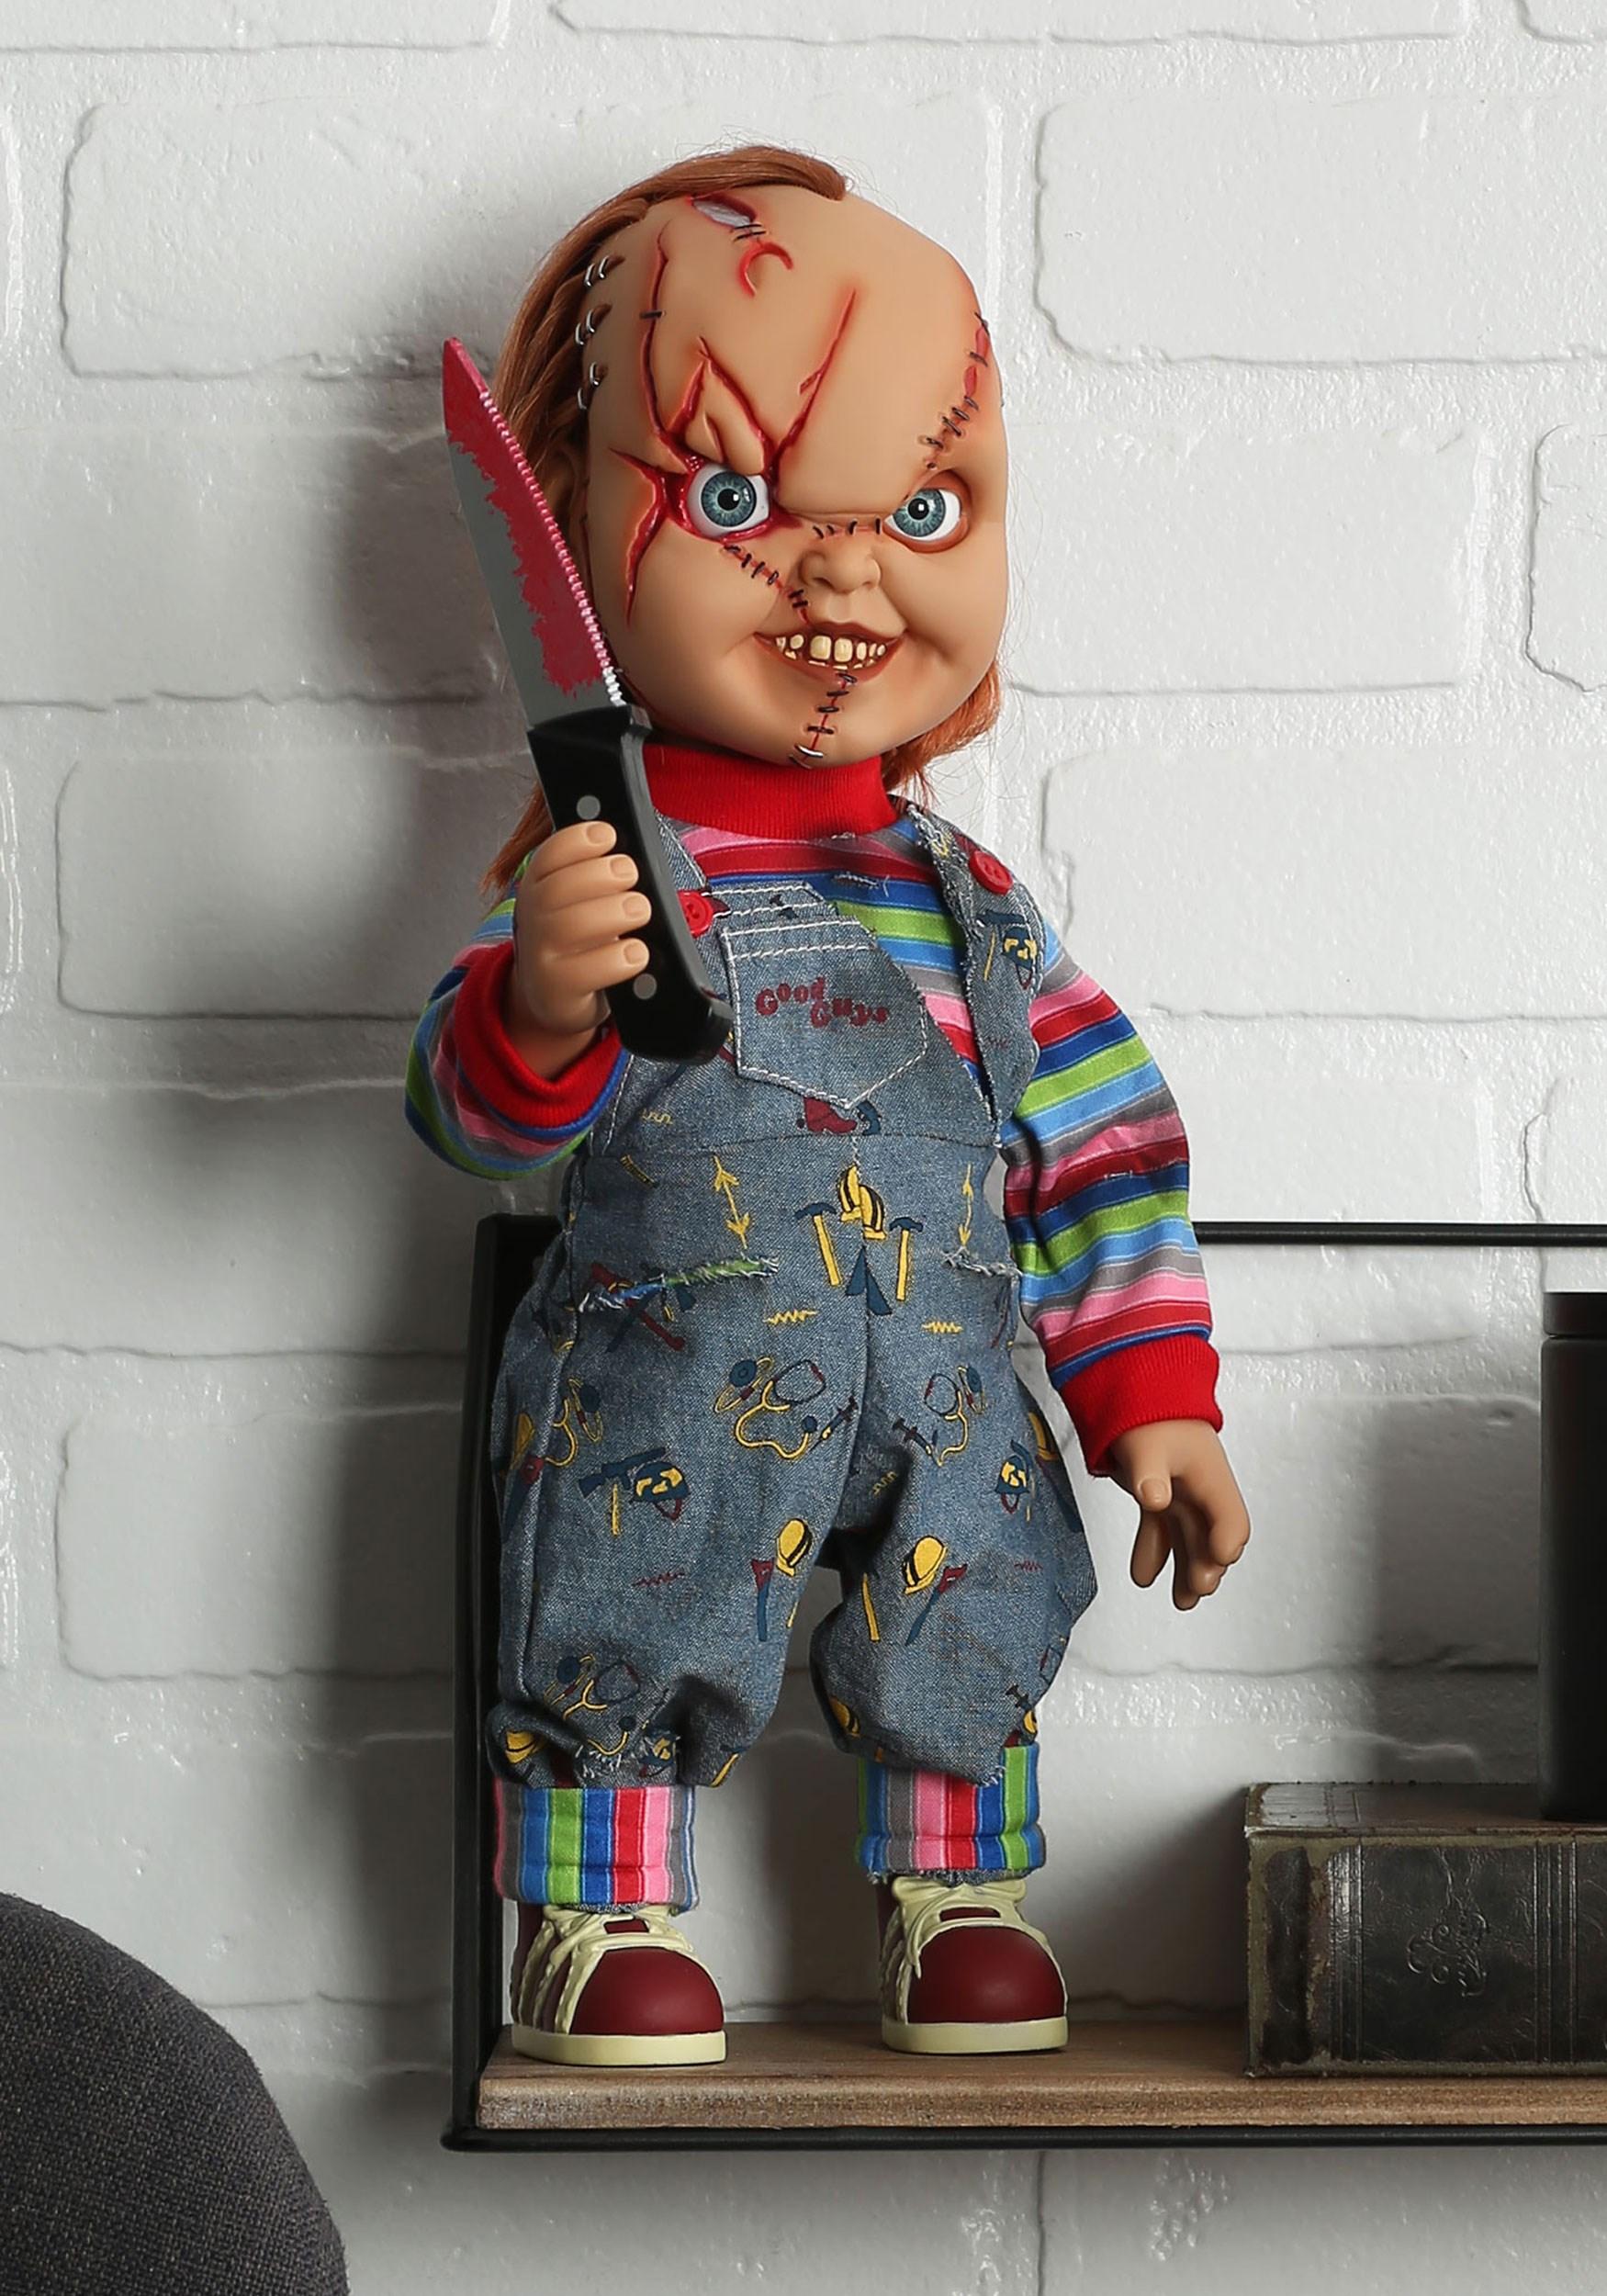 Chucky Scarred 15 Talking Good Guy Doll